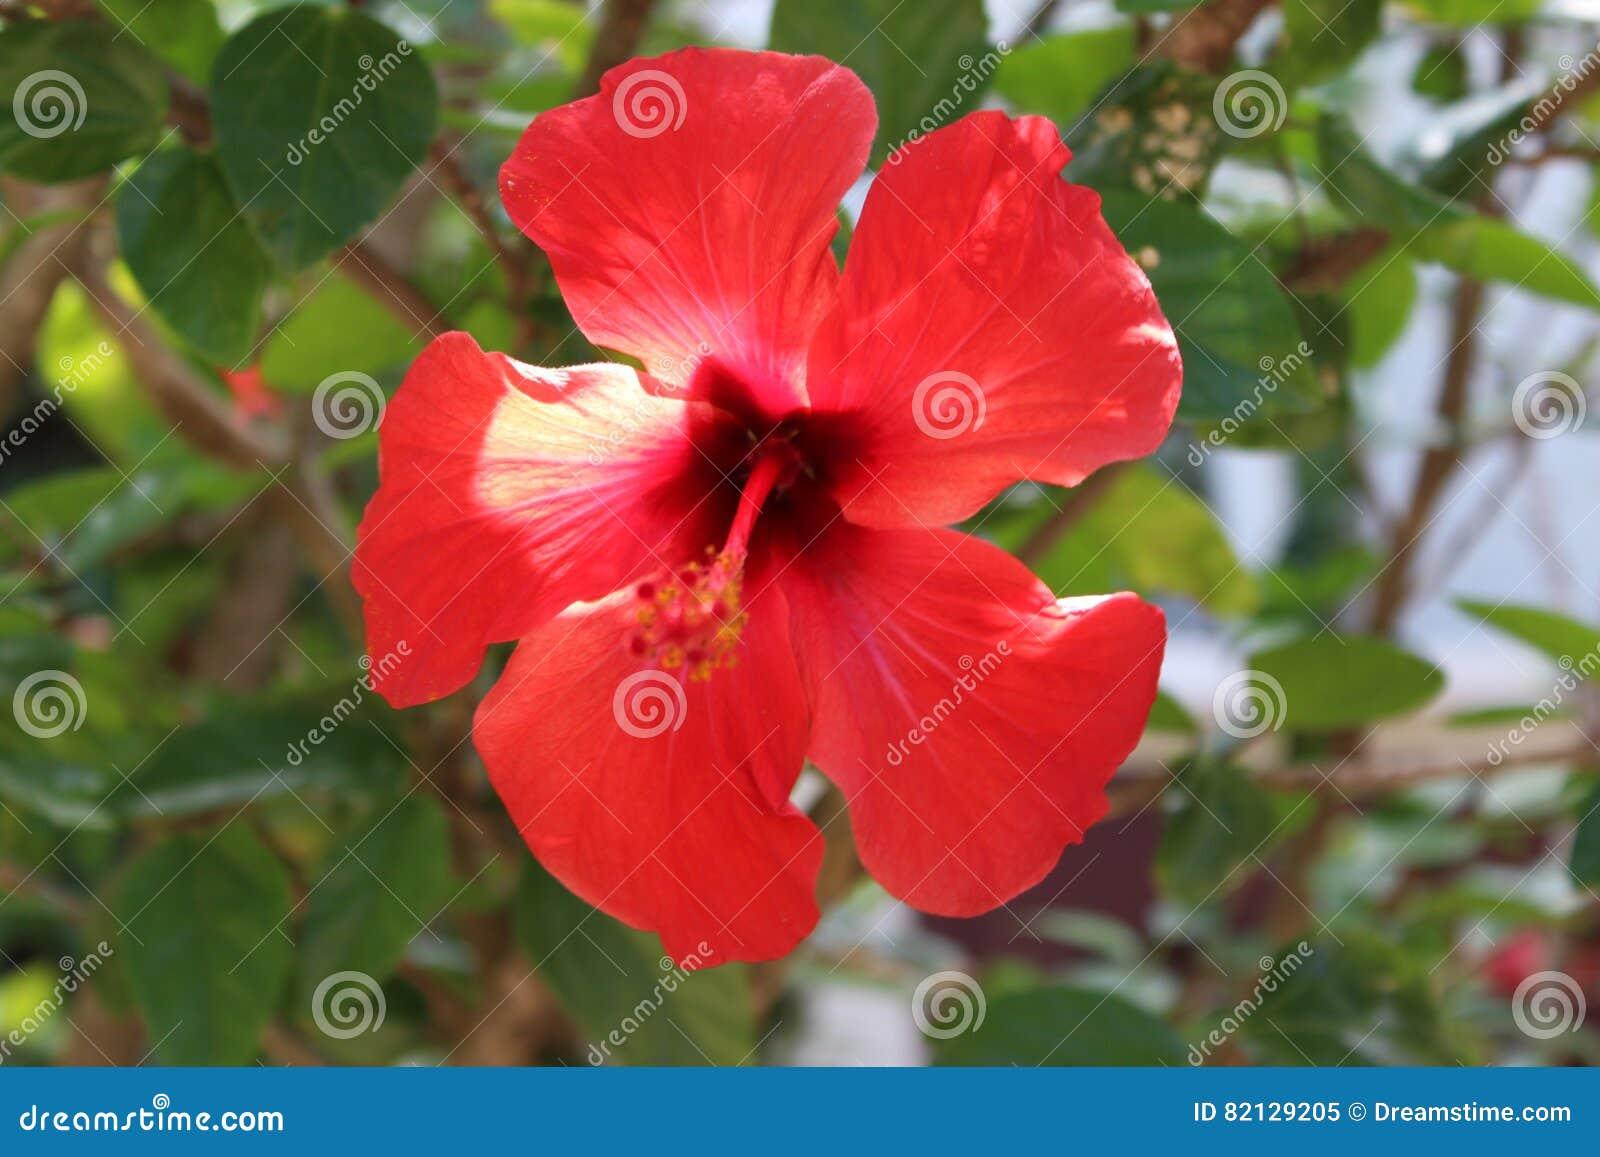 fleur hawaïenne photo stock - image: 82129205